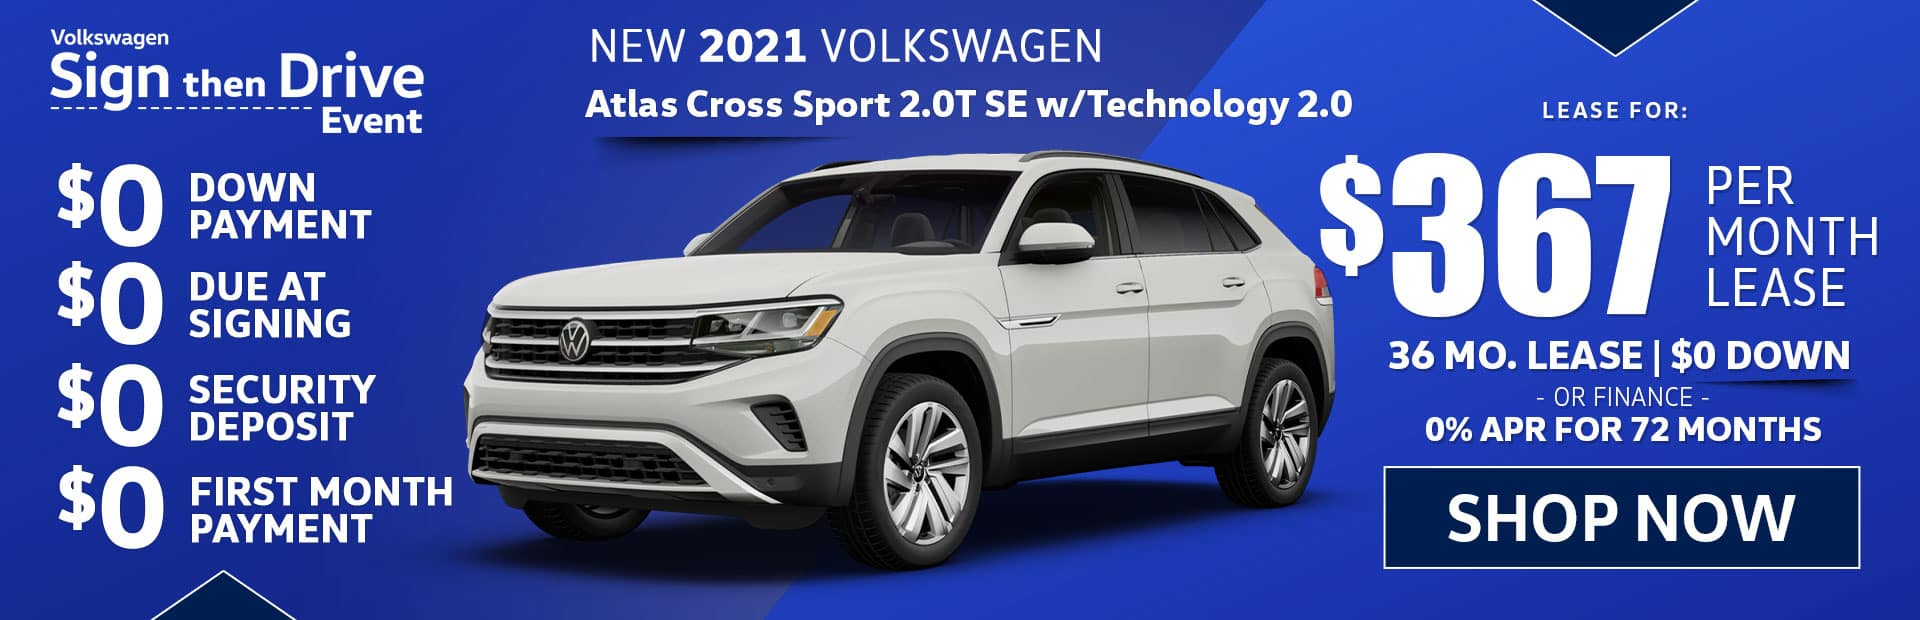 new 2021 vw atlas cross sport s lease special in los angeles best price